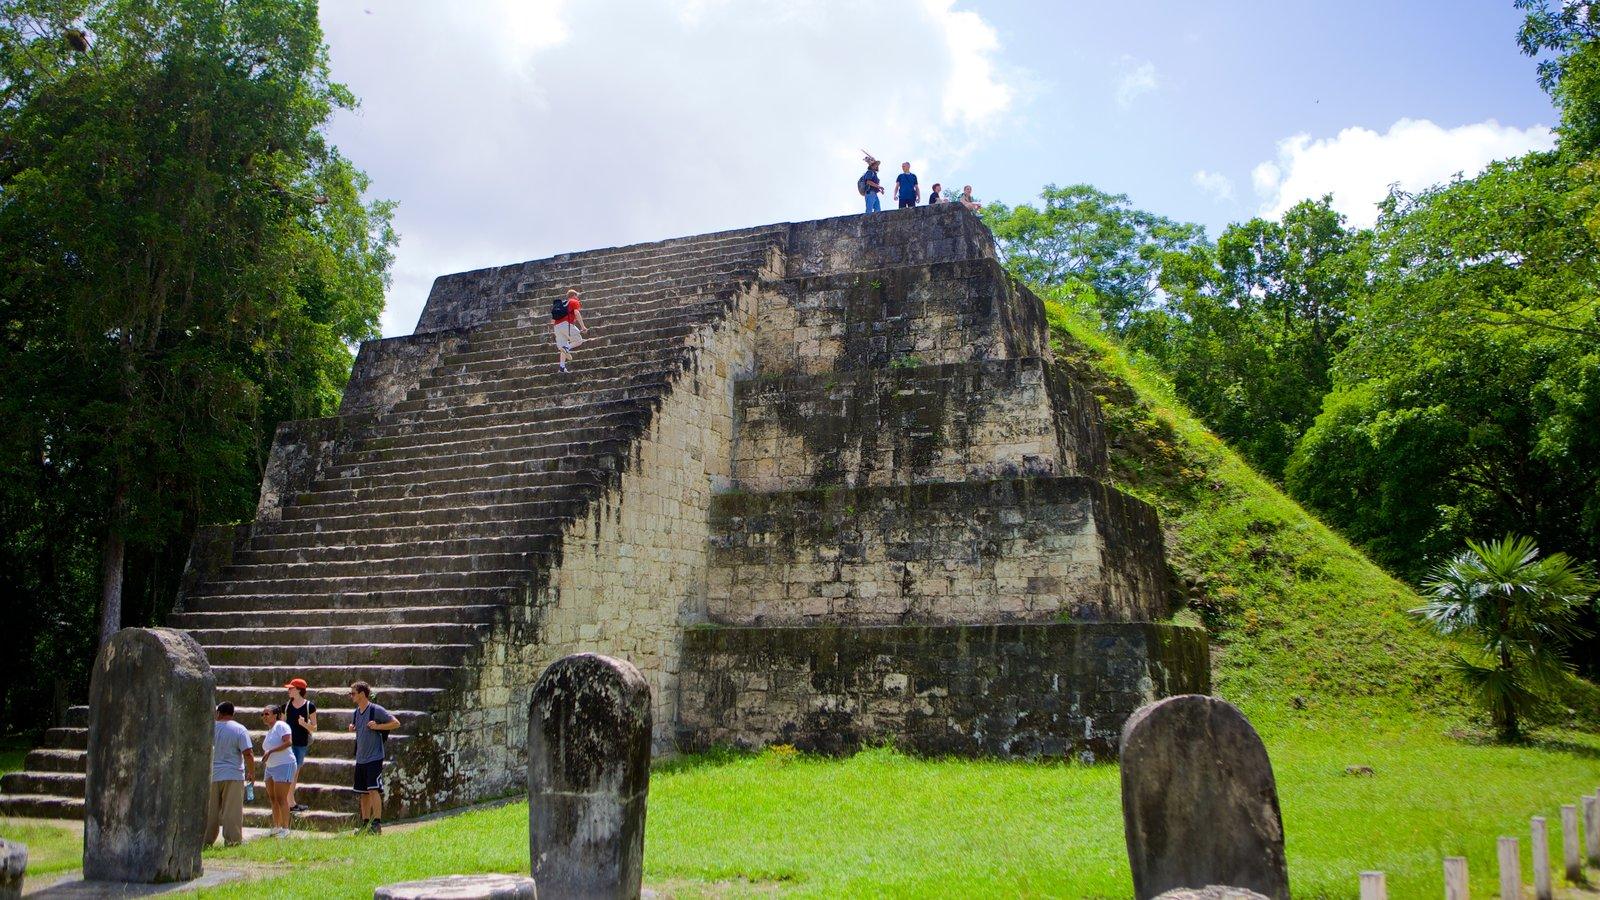 Tikal caracterizando ruínas de edifício, arquitetura de patrimônio e elementos de patrimônio